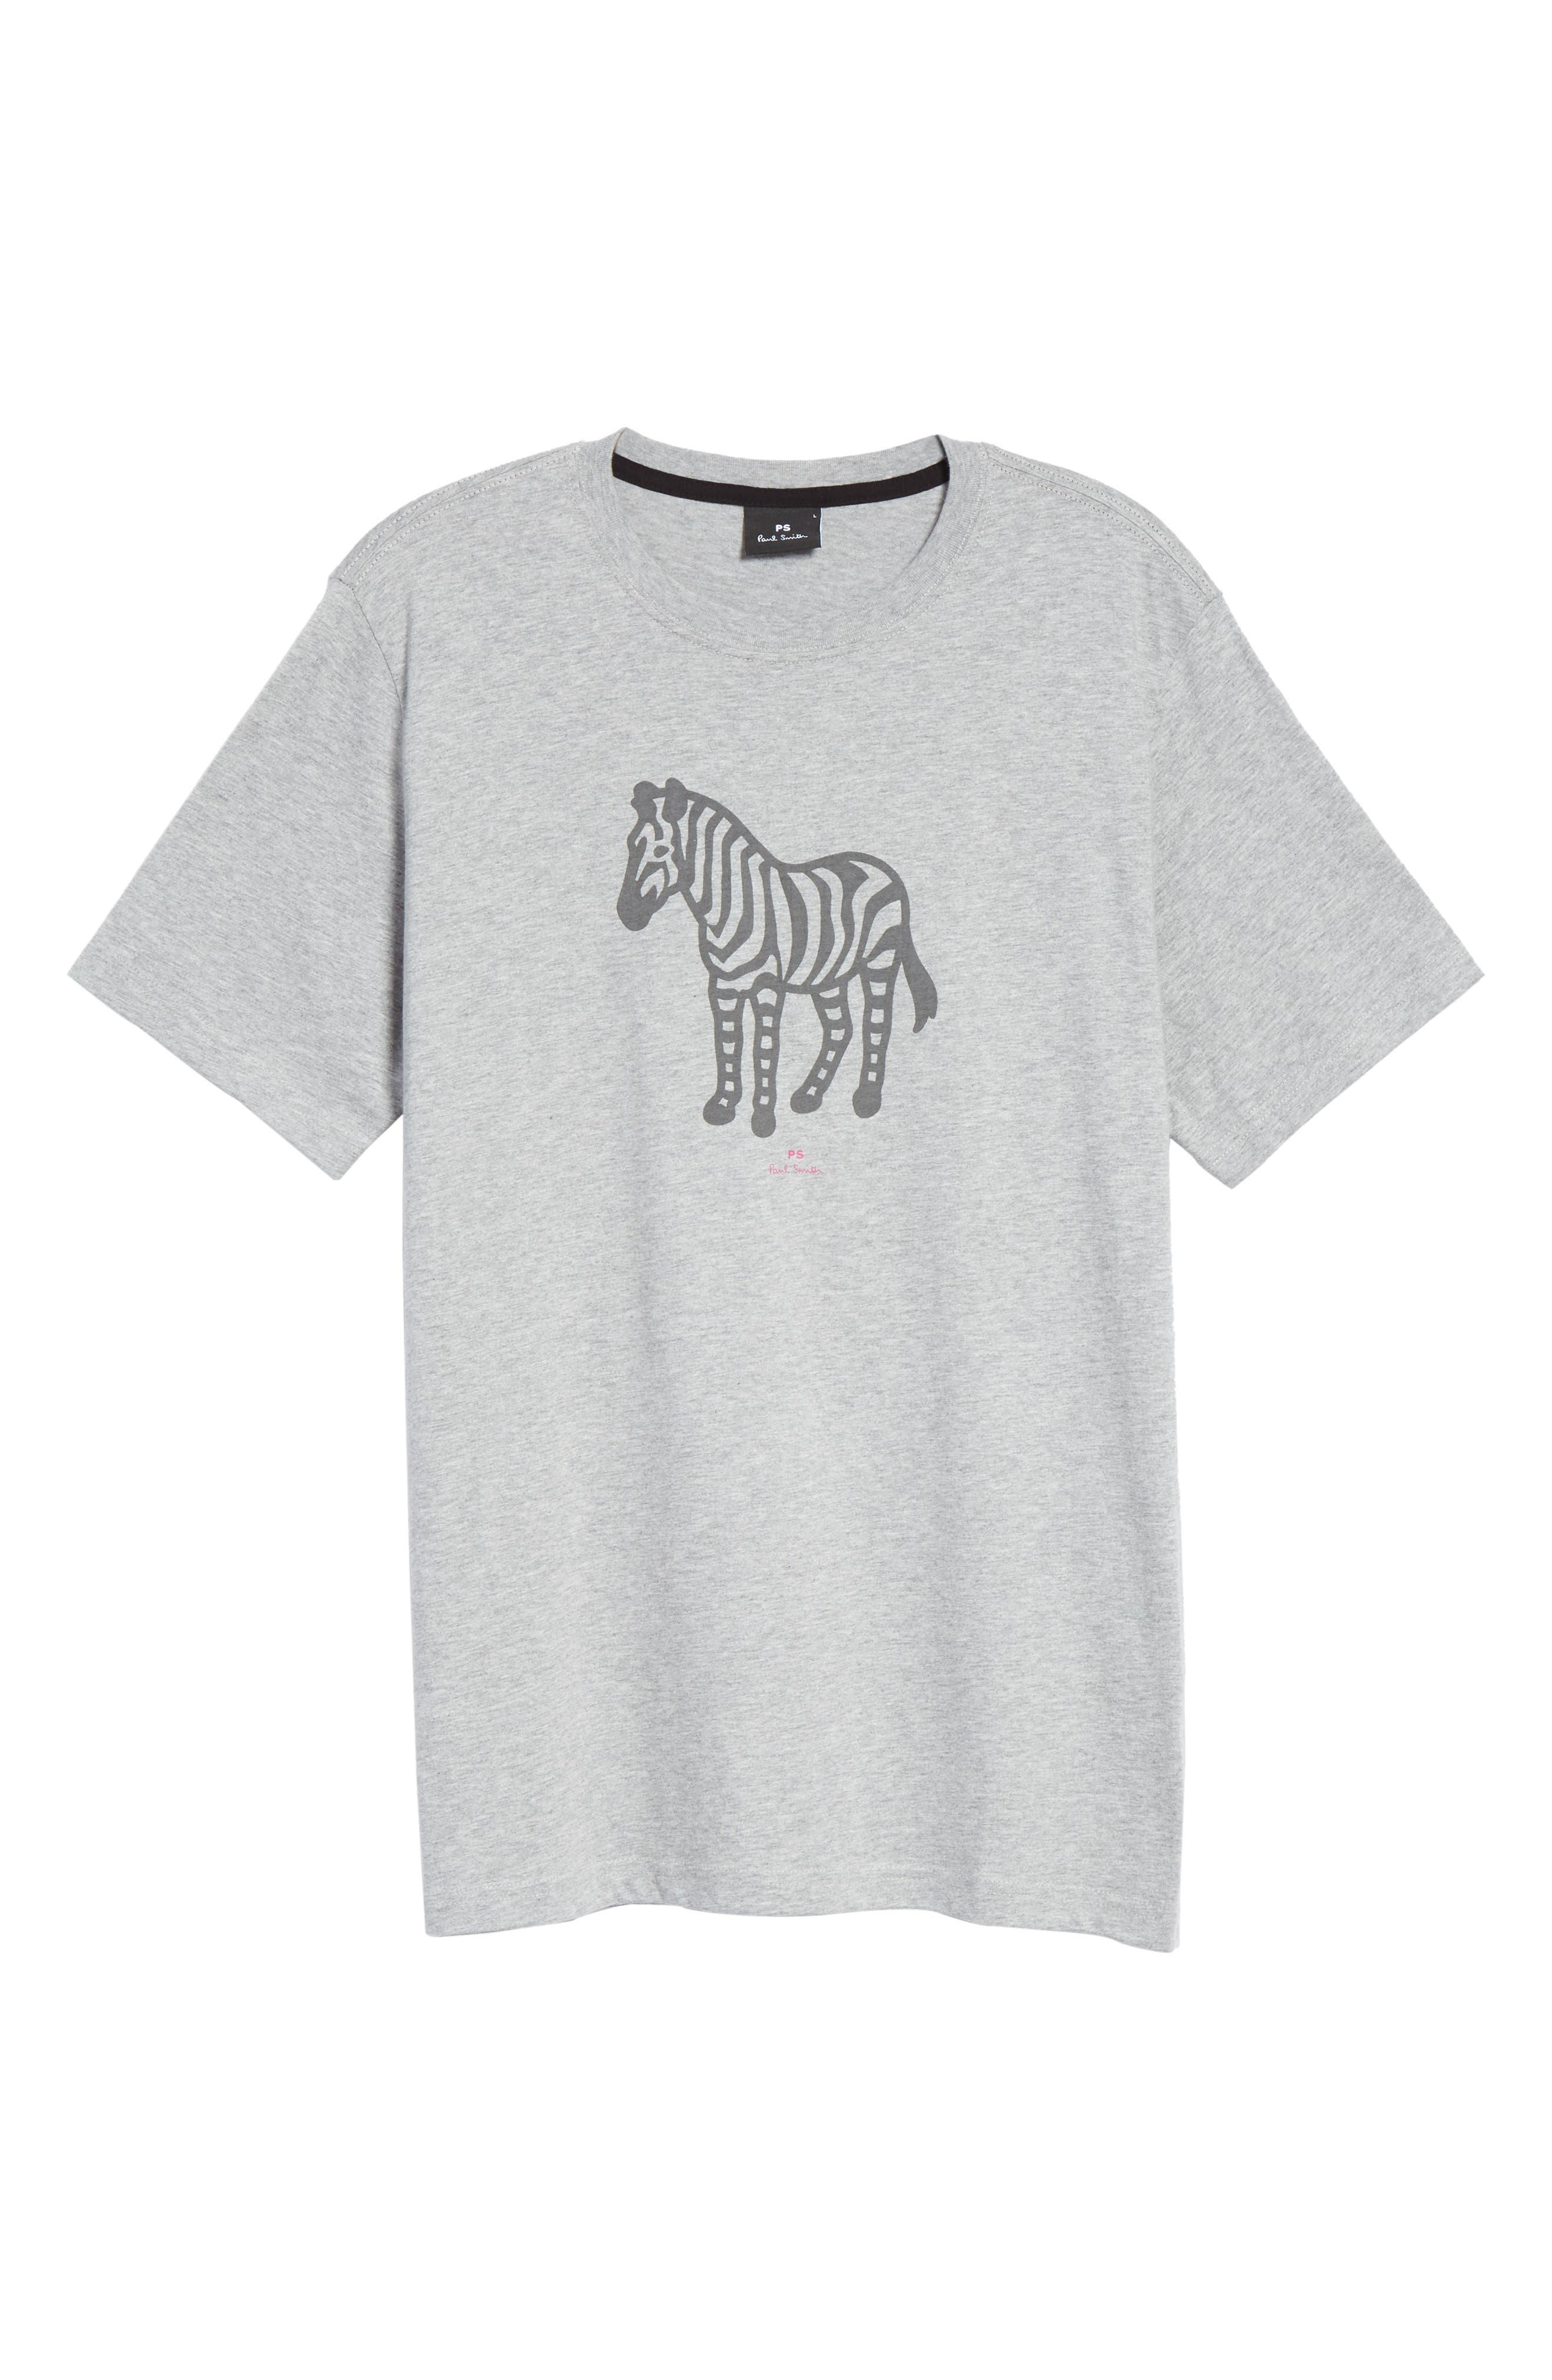 Zebra Organic Cotton T-Shirt,                             Alternate thumbnail 6, color,                             GREY